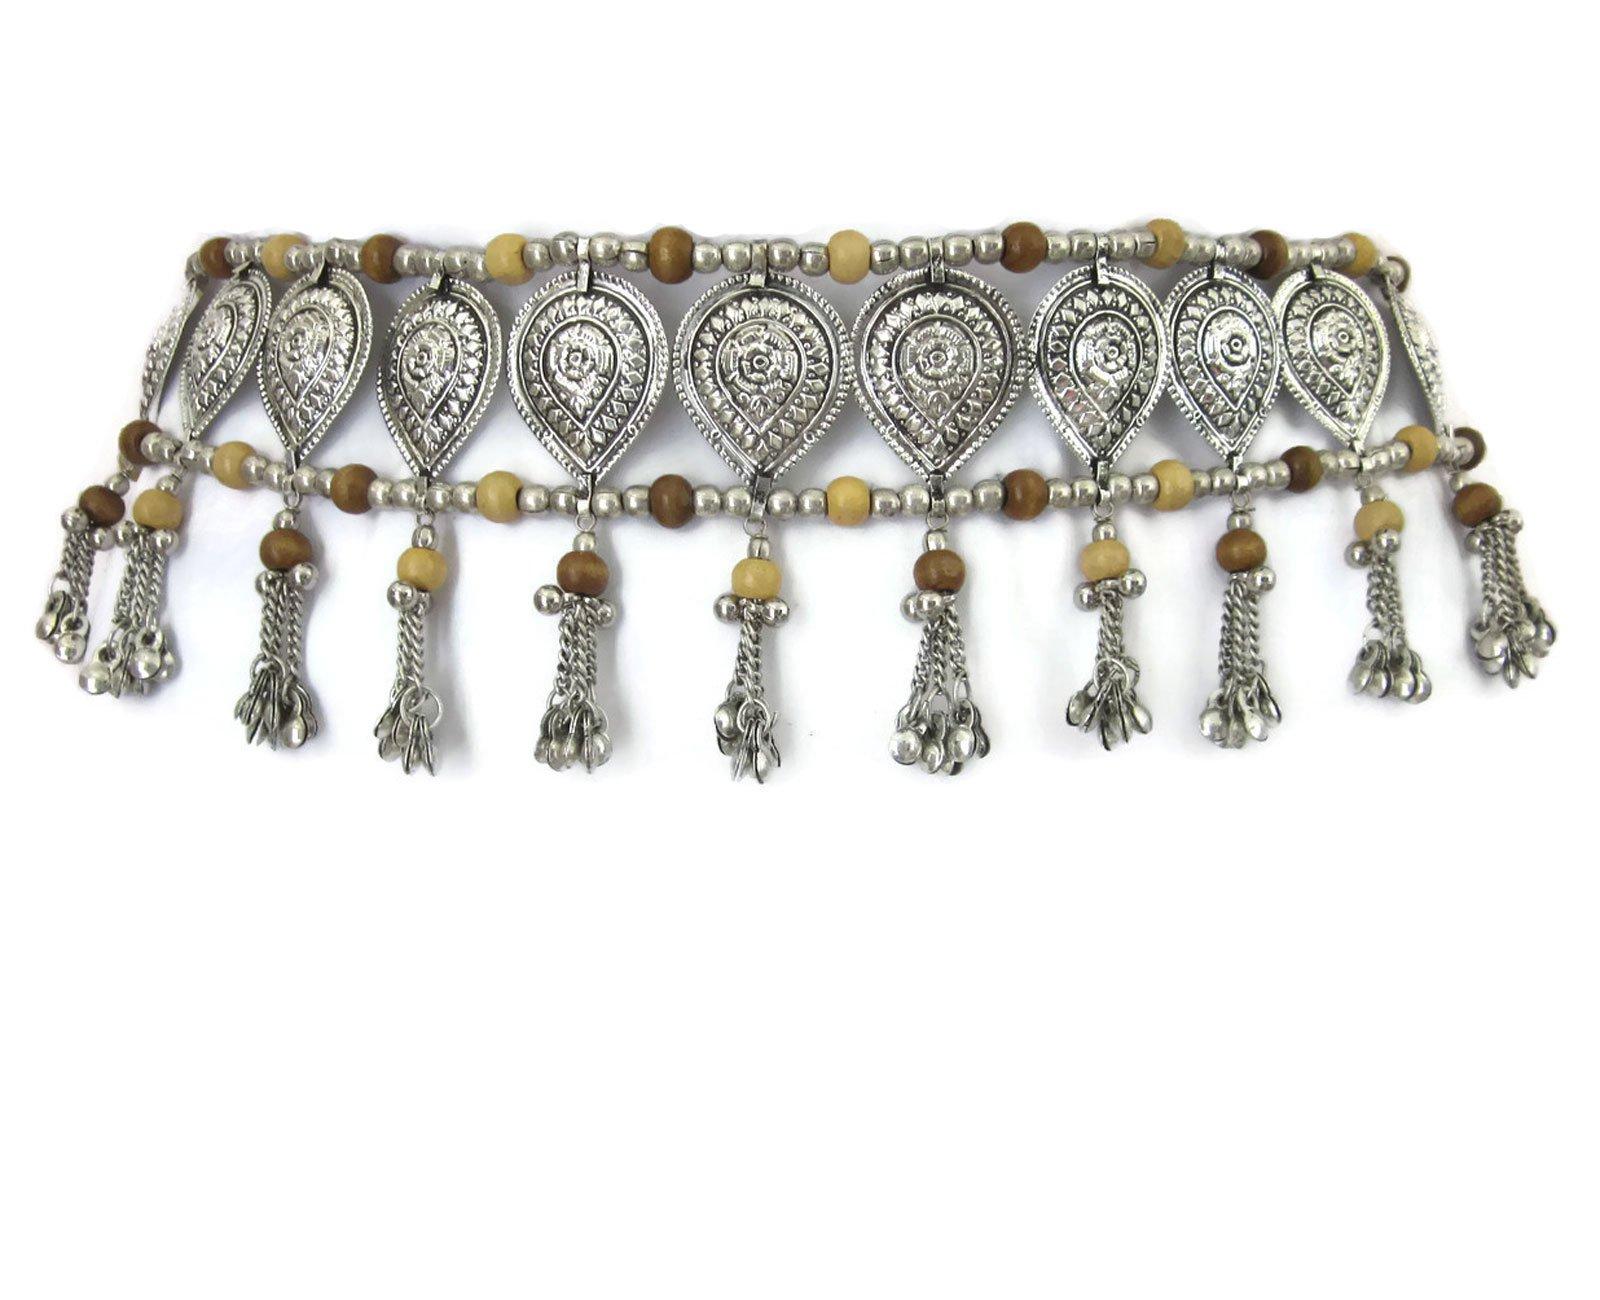 Womens Fashion Sash Belt | Bohemian Gypsy Hippie Music Festival Kuchi Tribal Belly Dance Style | Handcrafted Teardrop Medallions Wood Beads Metal Chain Tassels Boho Wedding Hip Waist Novelty Accessory